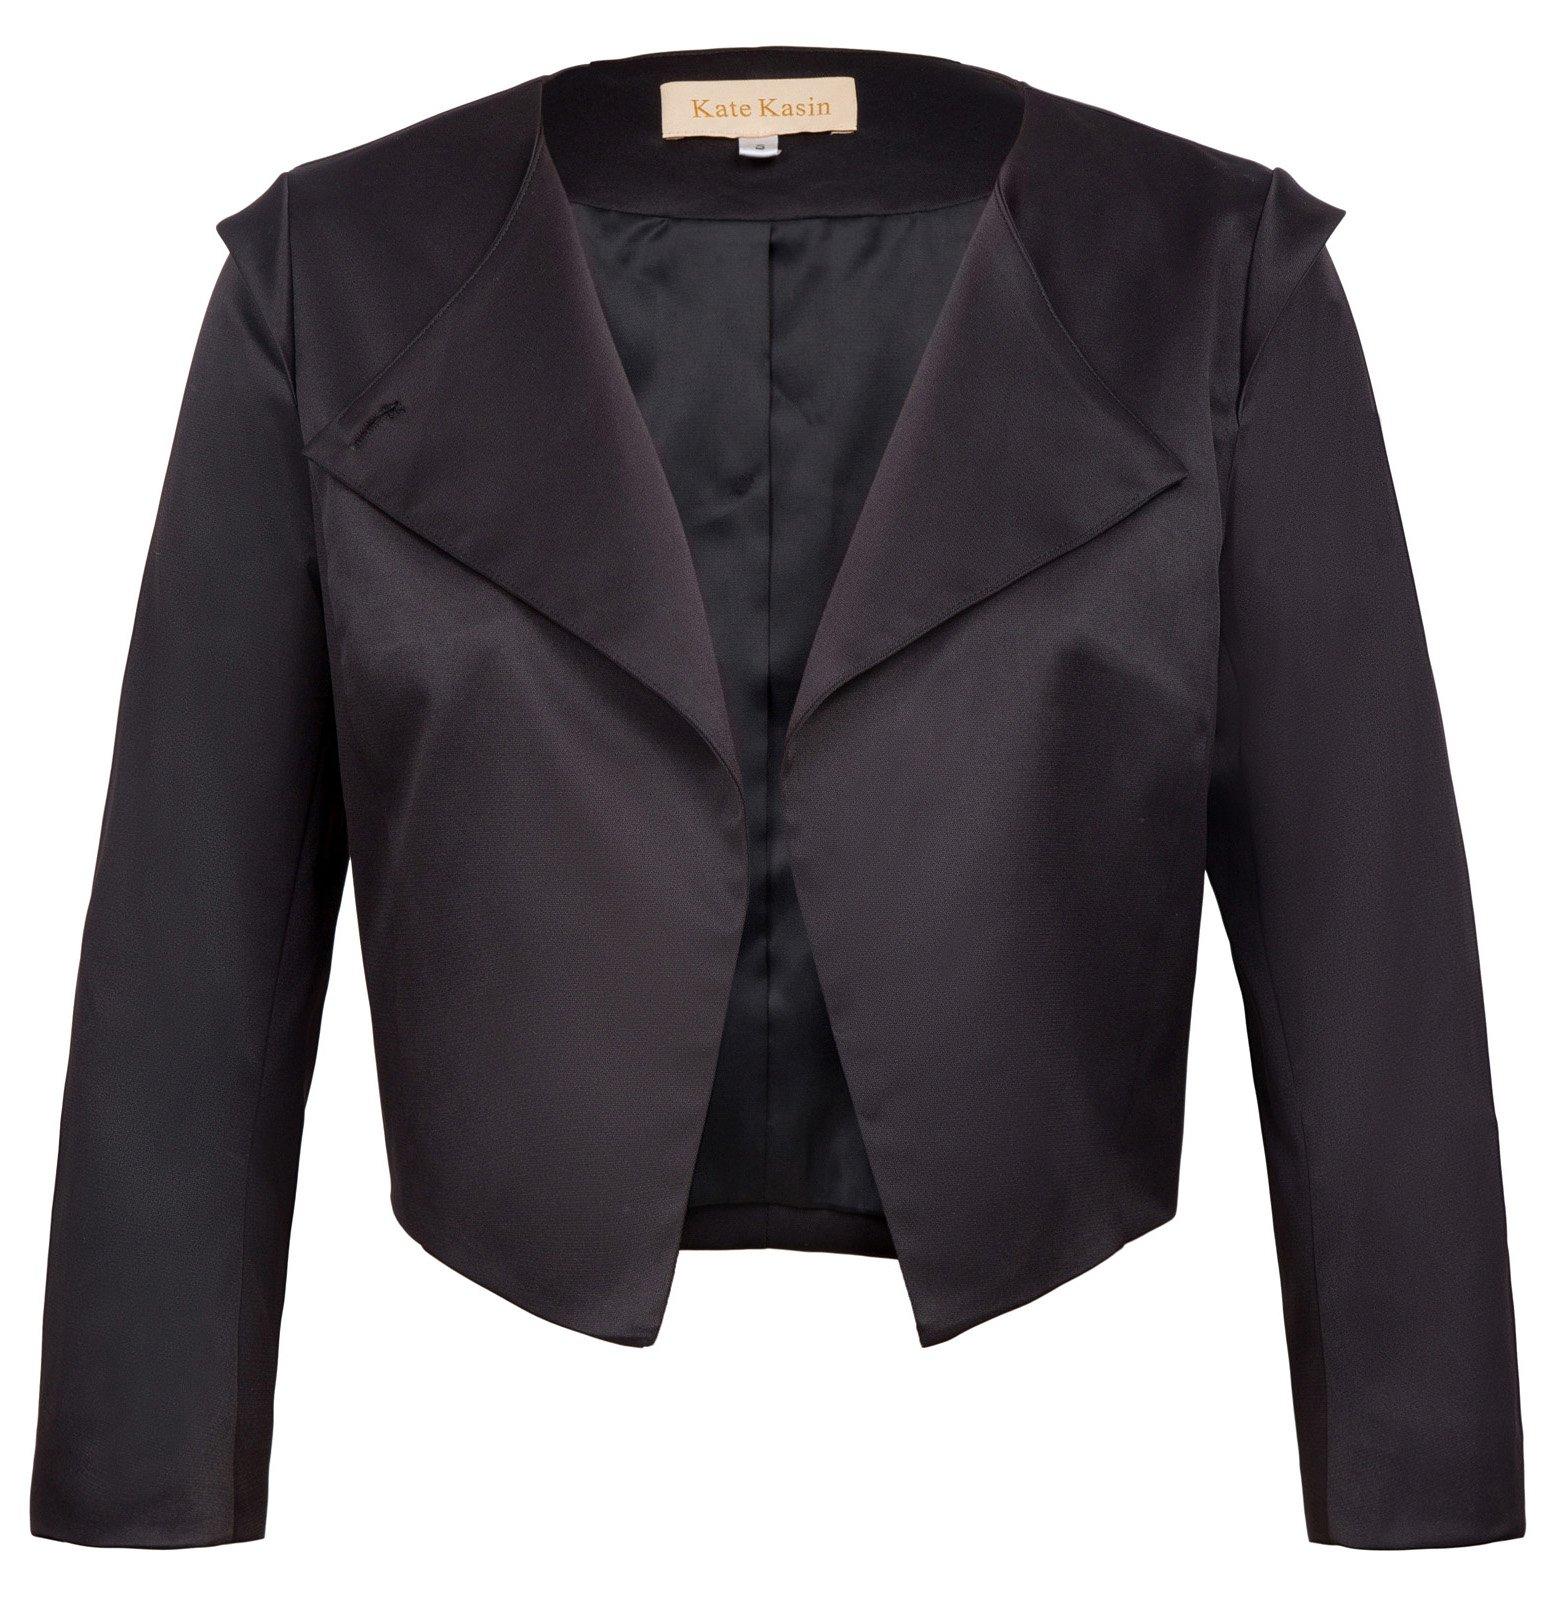 Women's Cropped Sleeves Lapel Collar Asymmetric Blazer Coat M KK773